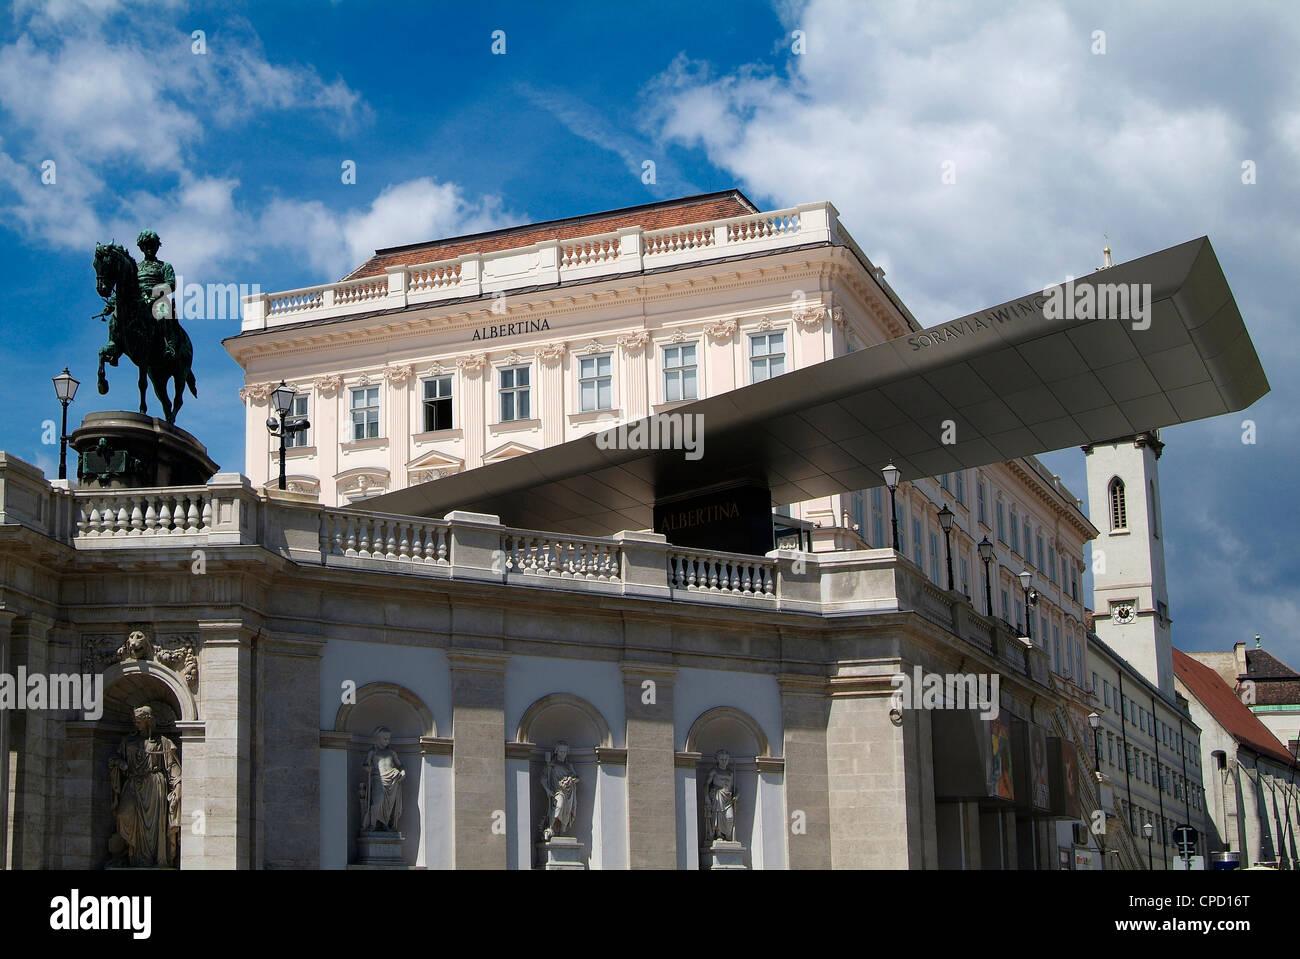 Albertina, Viena, Austria, Europa Imagen De Stock